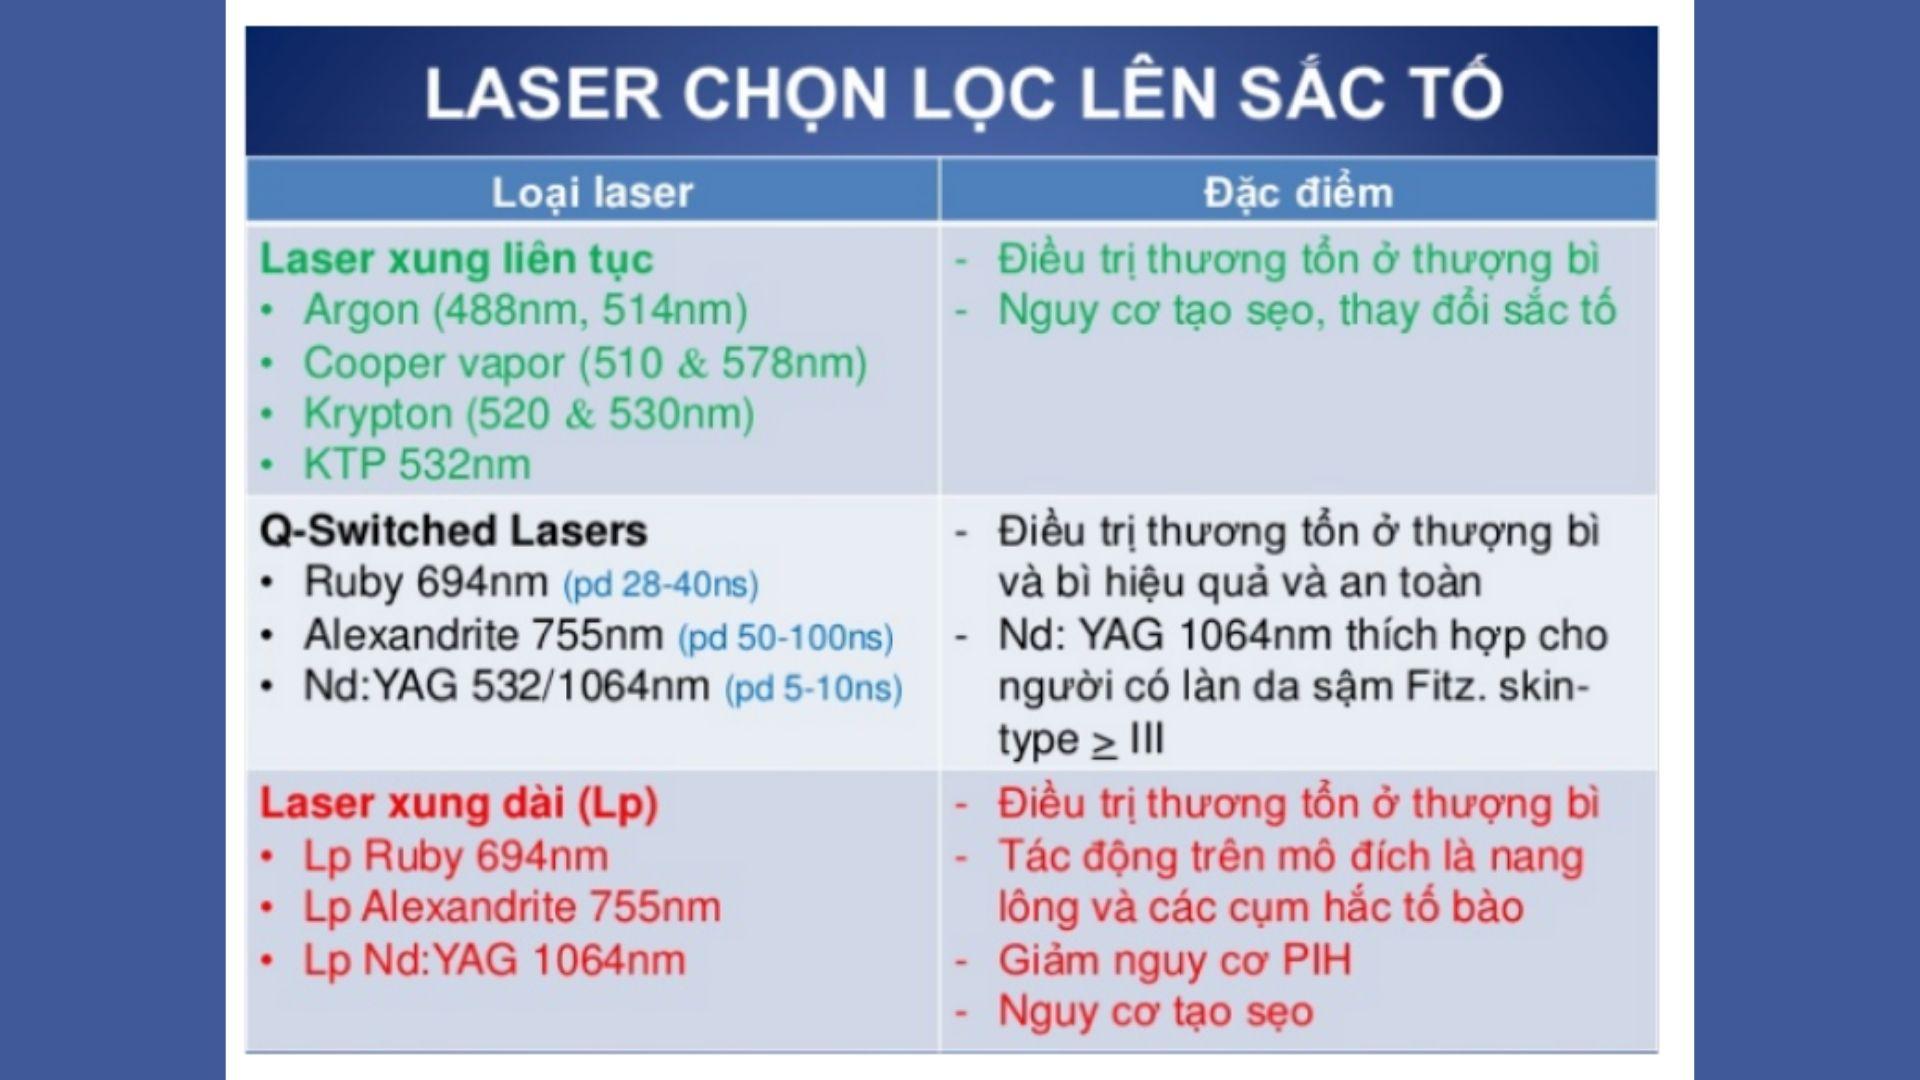 Laser chọn lọc sắc tố